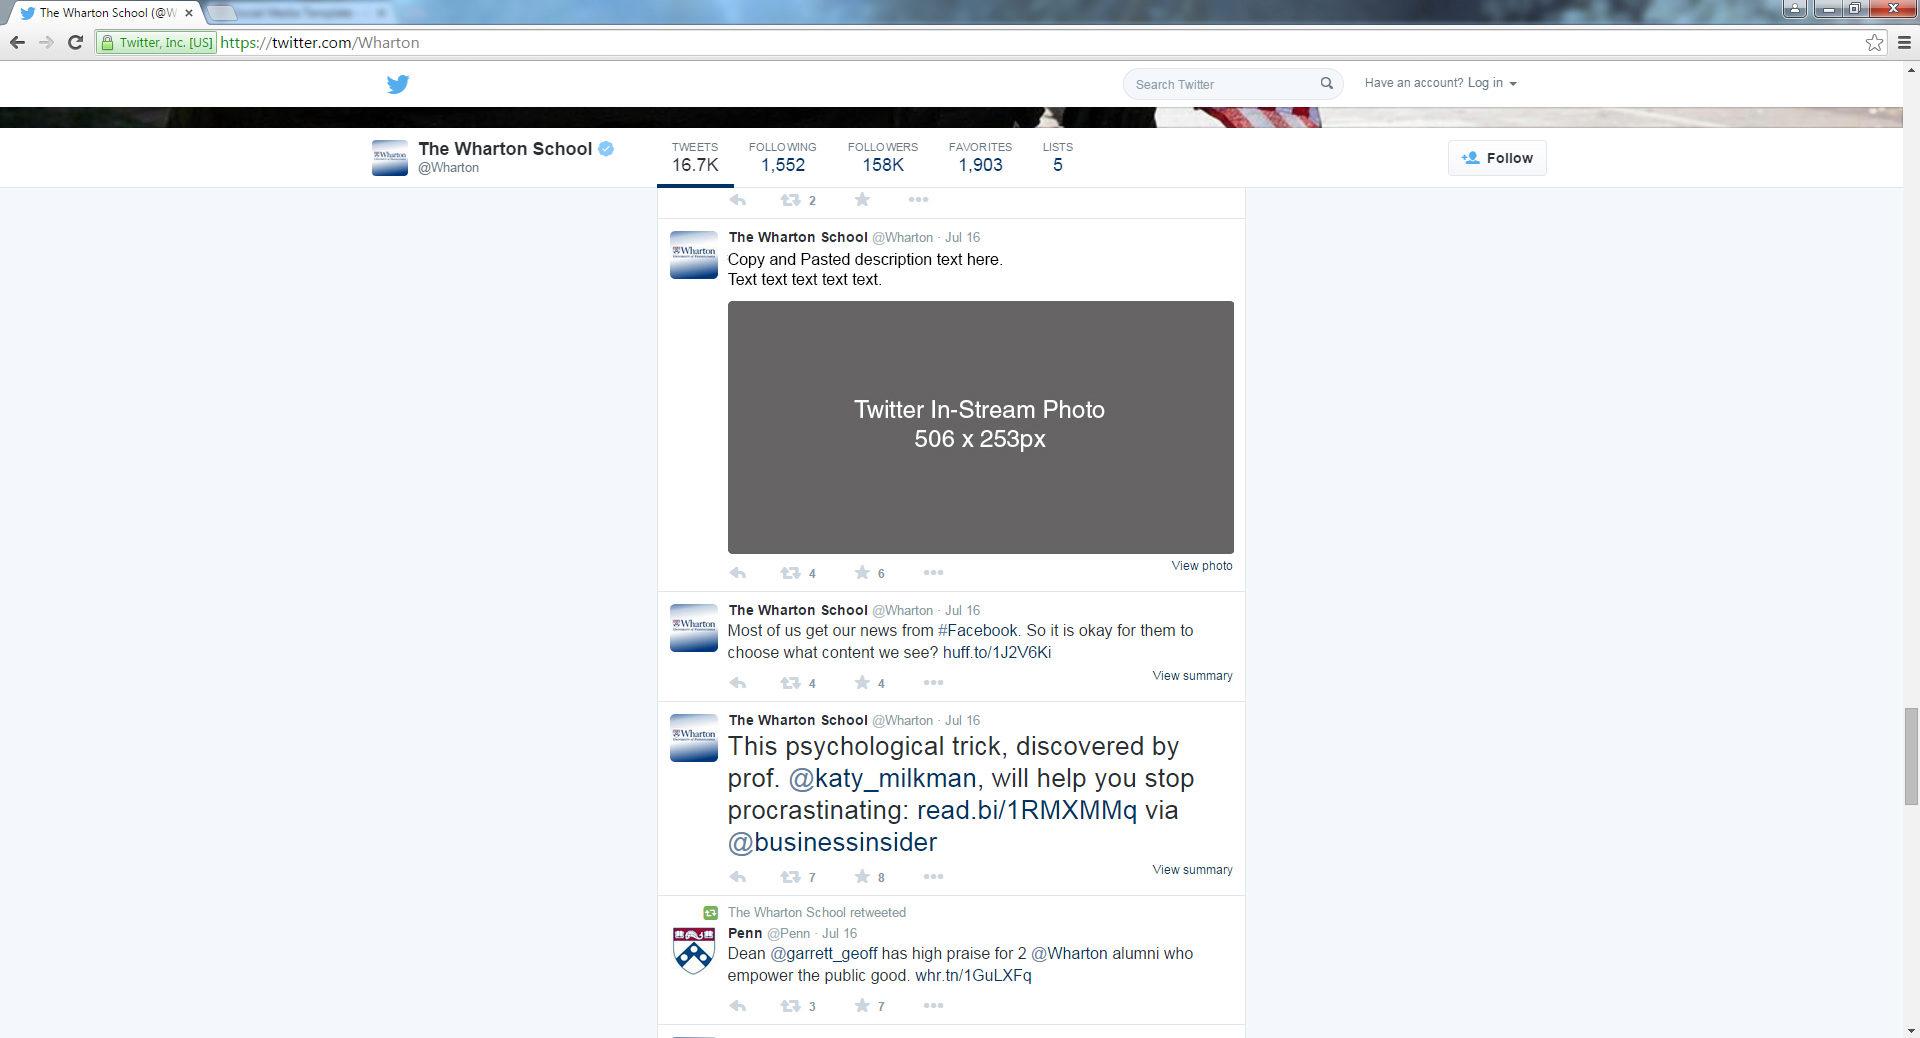 Twitter_In-stream_Photo_EXAMPLE